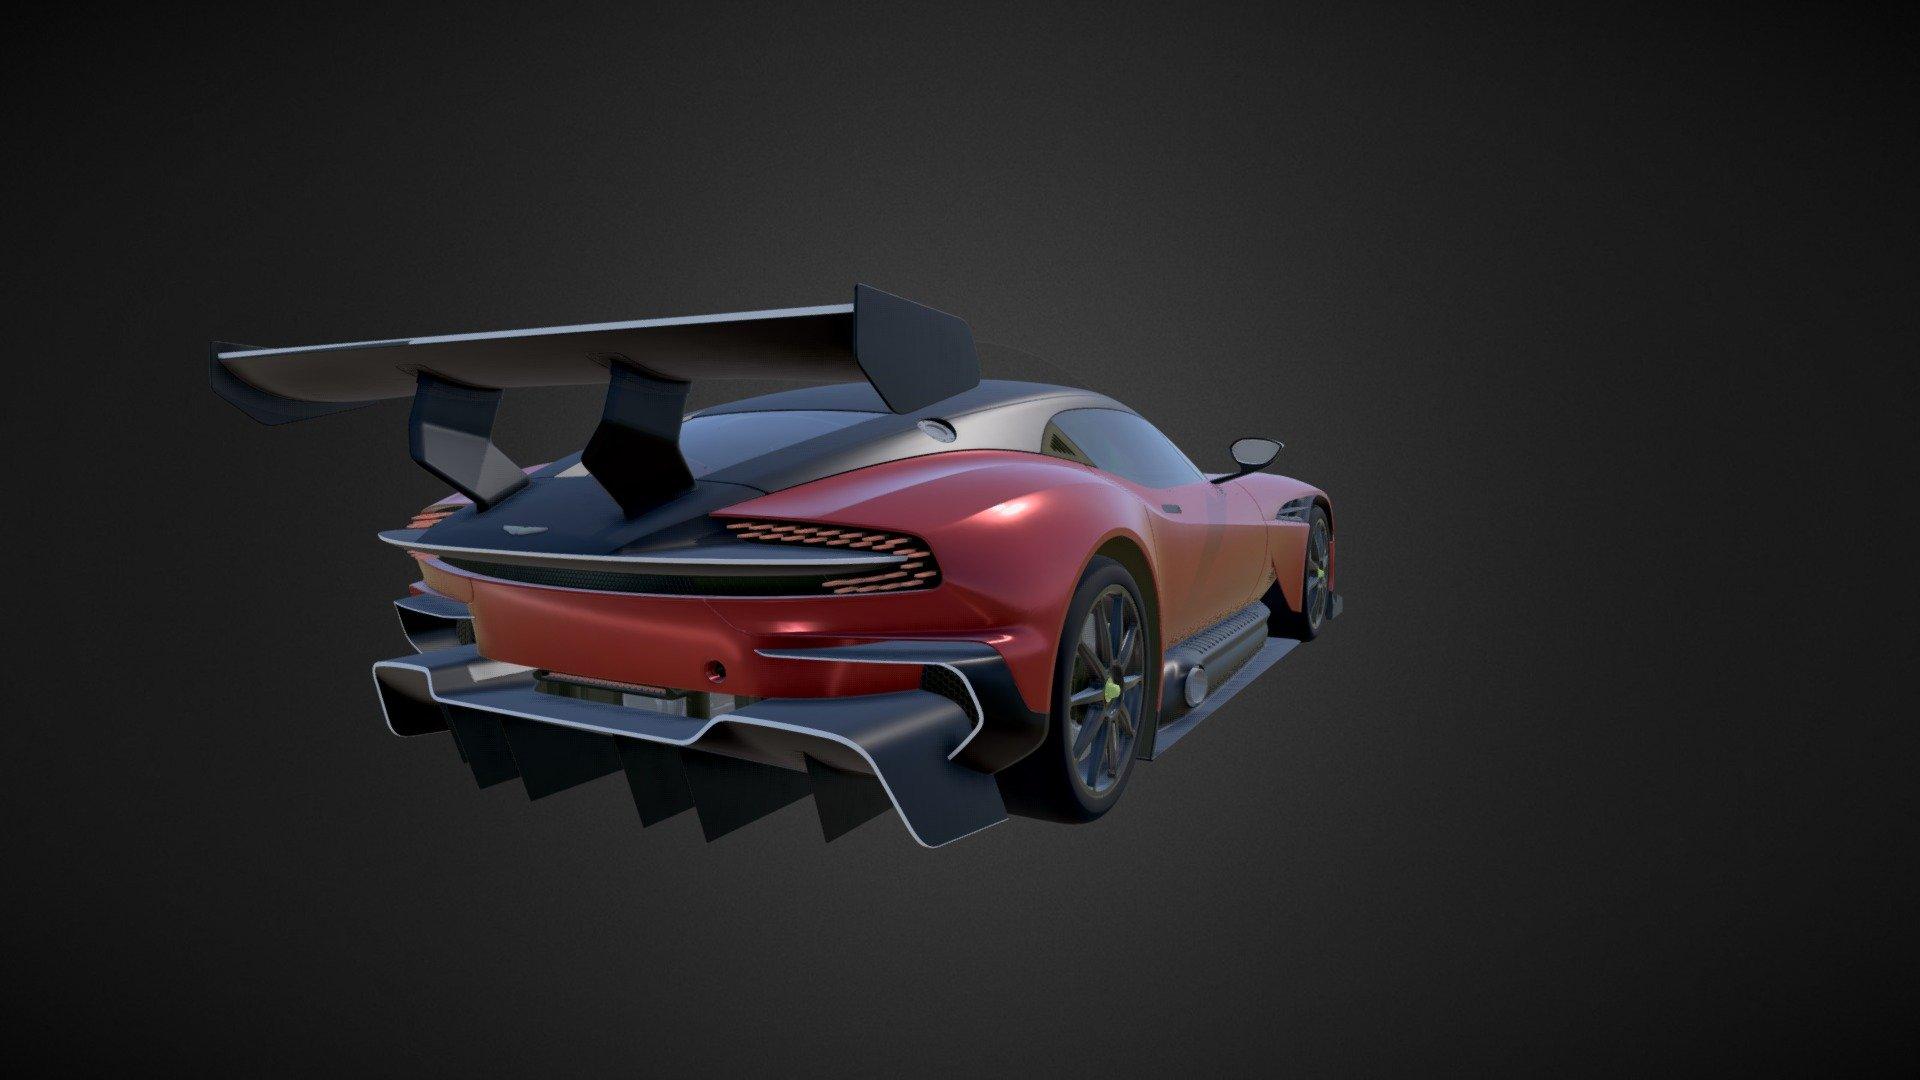 Aston Martin Vulcan Buy Royalty Free 3d Model By Evodelize Evodelize Dc7d9c8